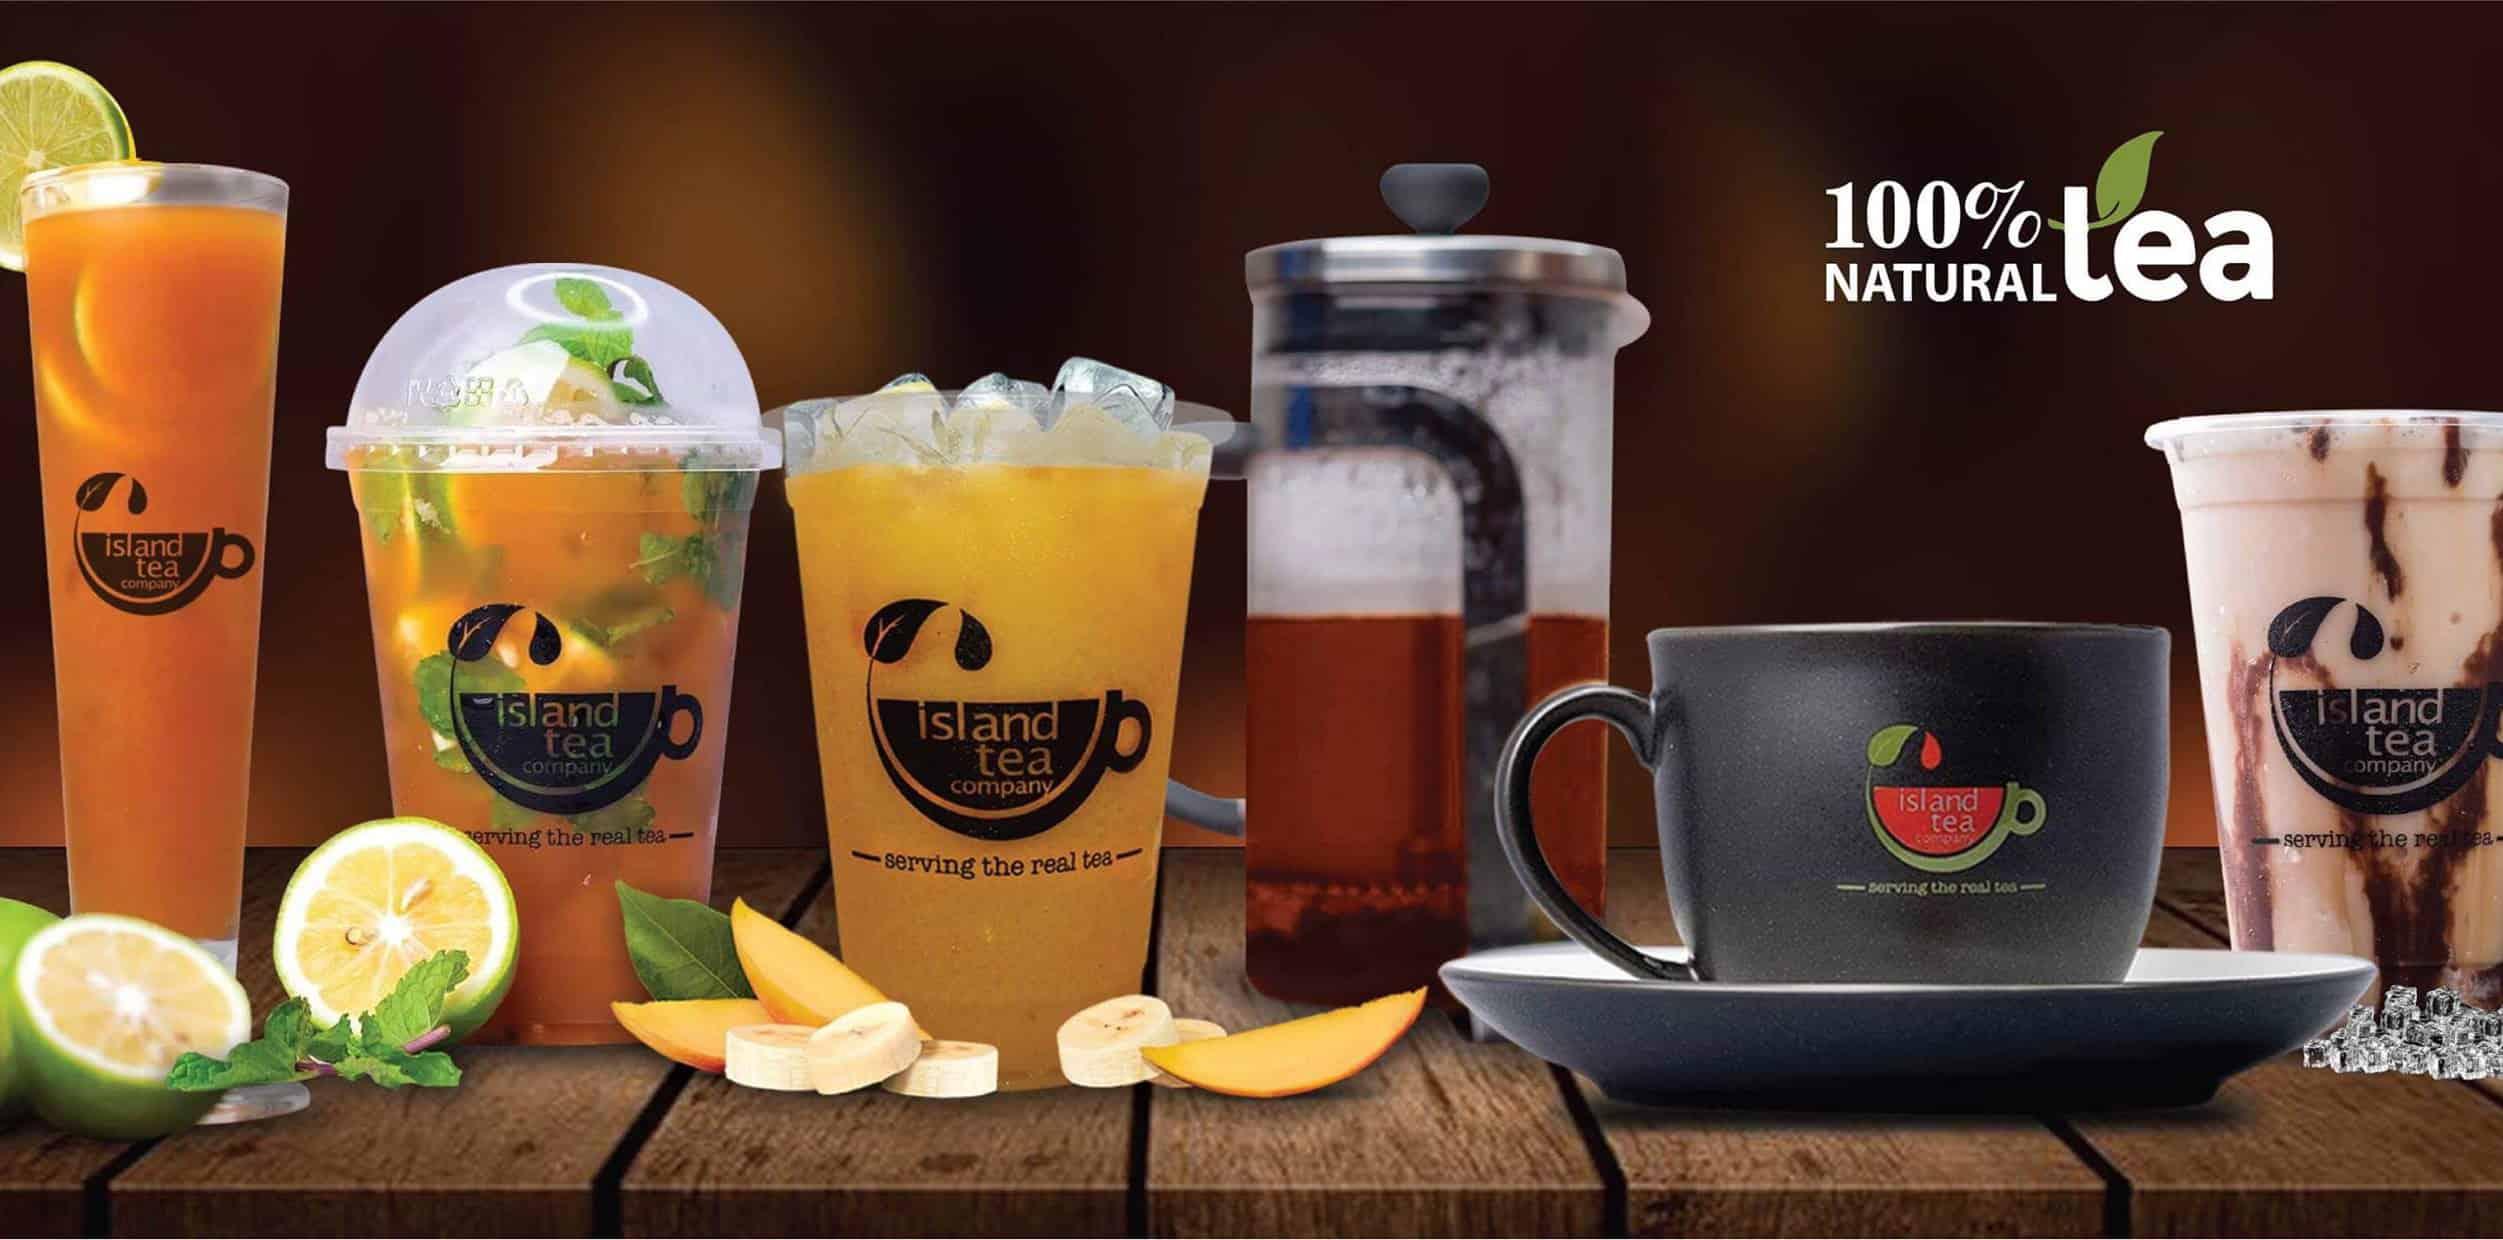 Best Green Tea Brand For Weight Loss In Sri Lanka ✓ The